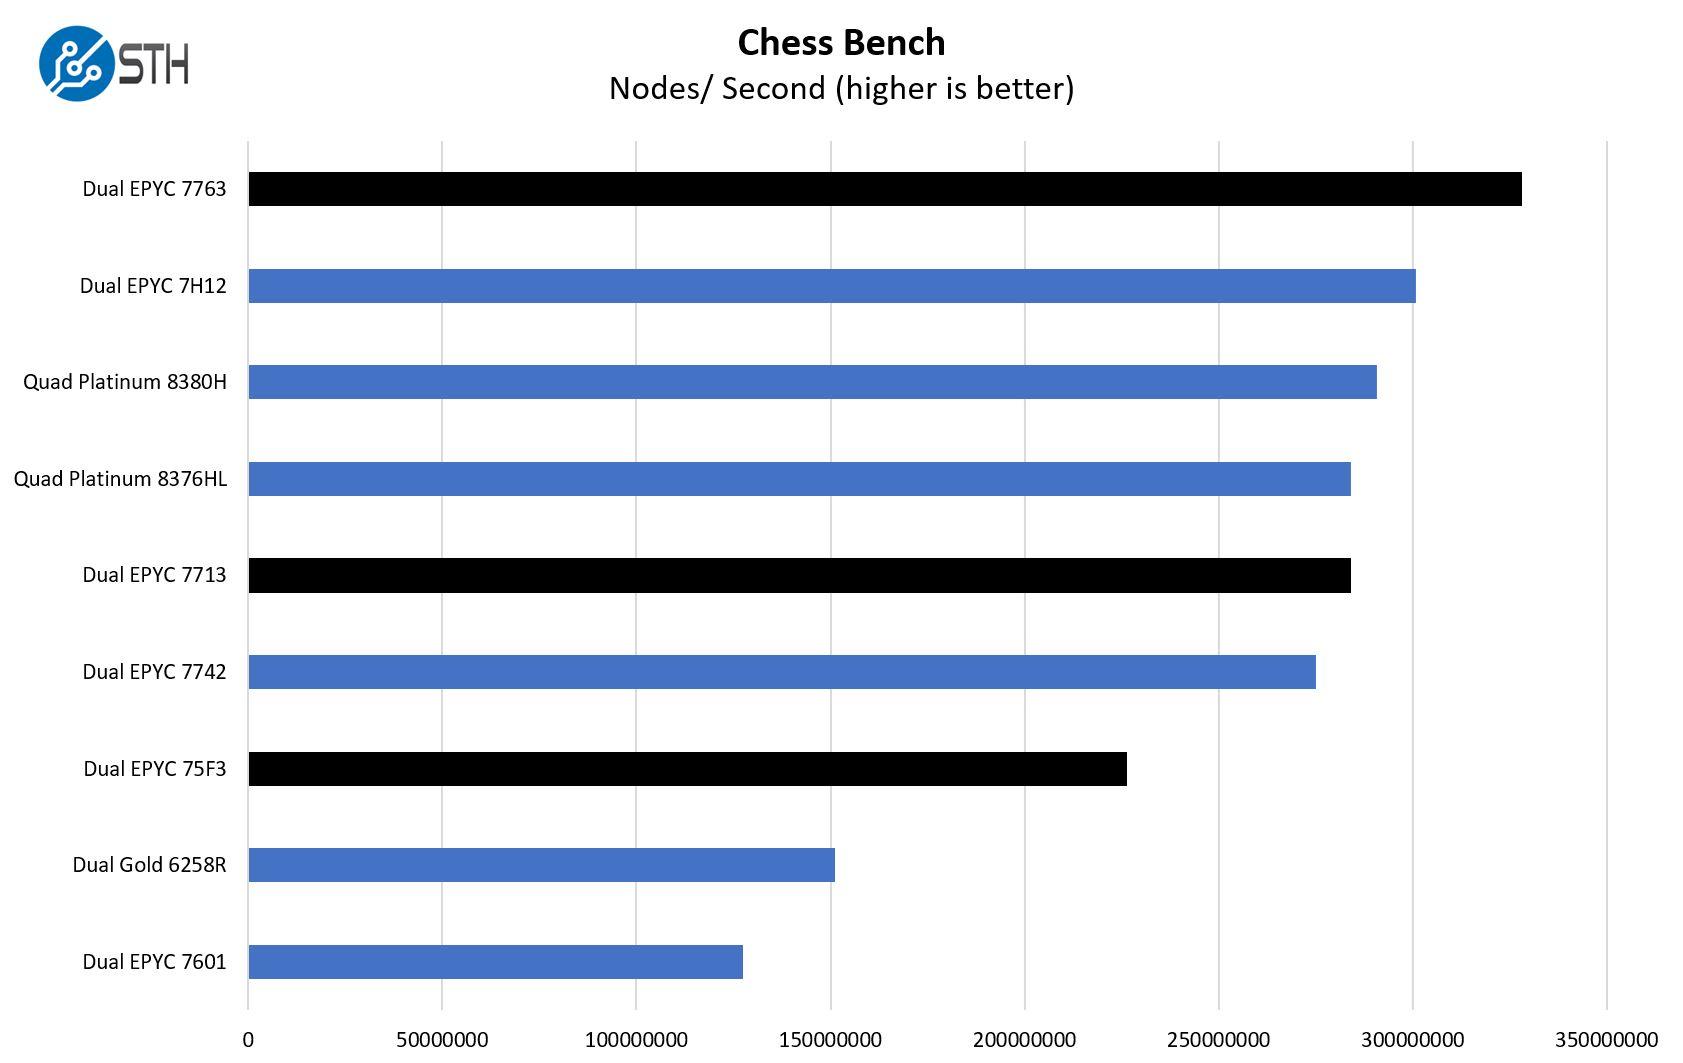 AMD EPYC 7003 High End Chess Performance